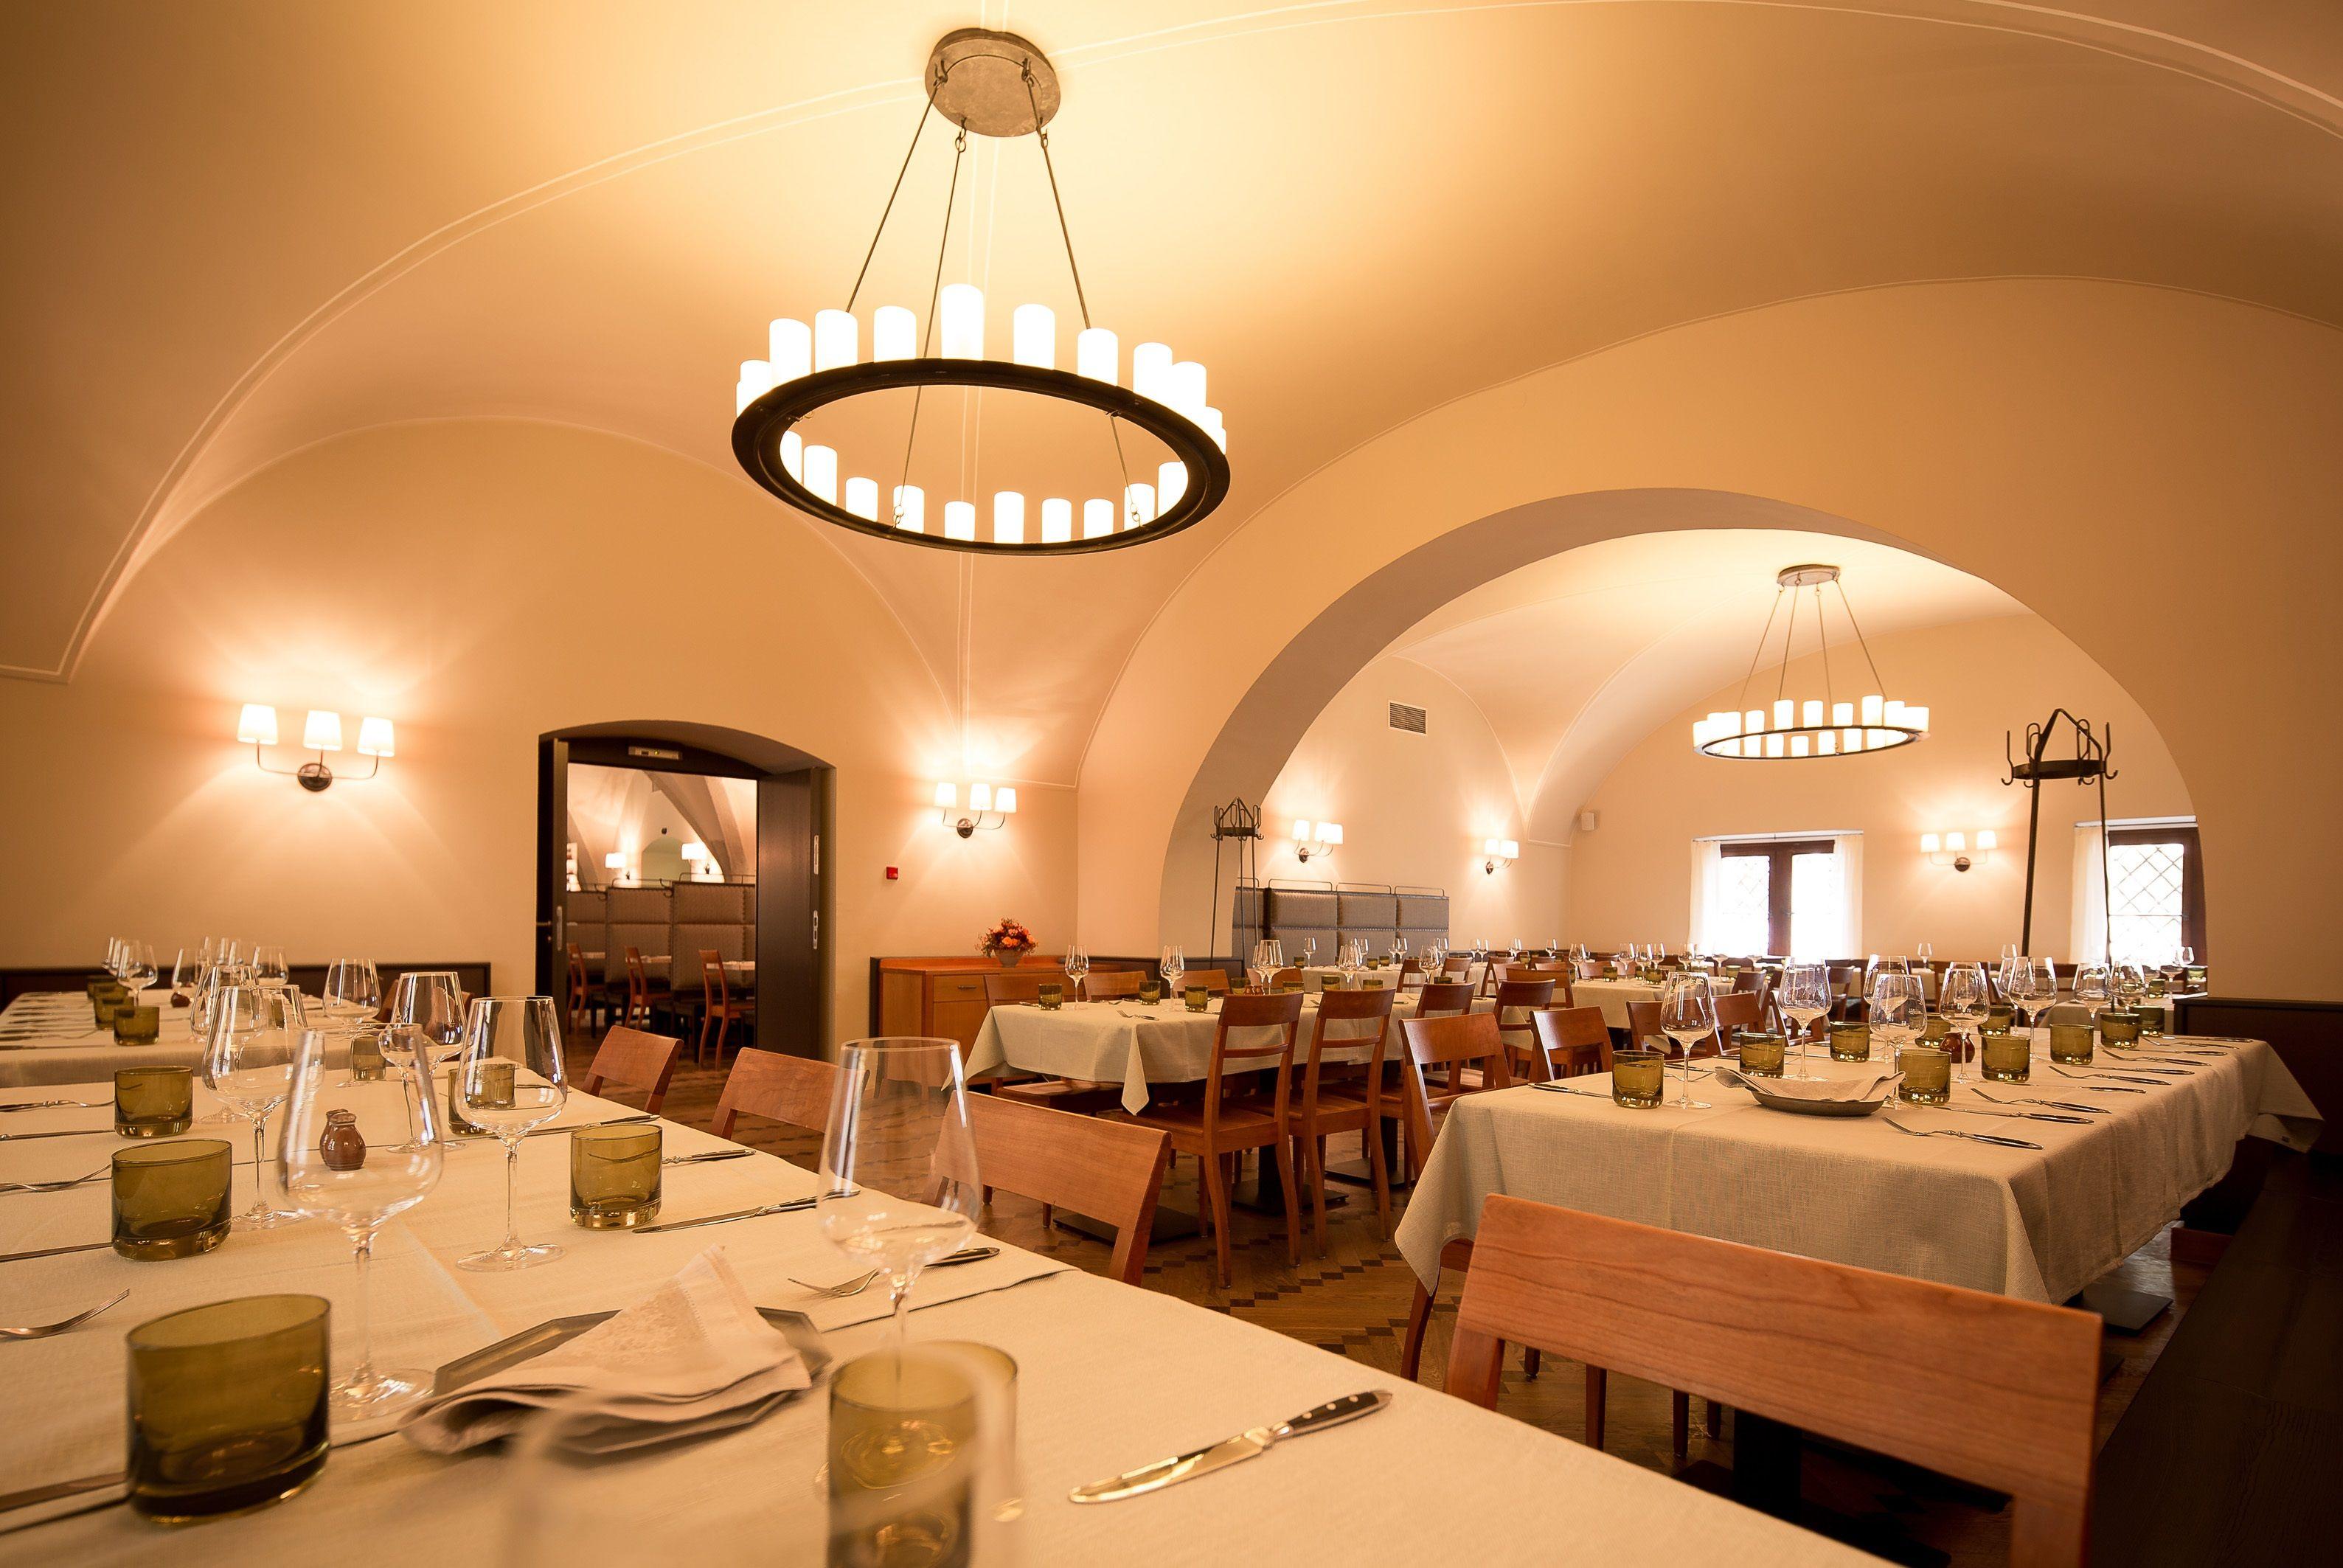 Restaurant Alter Hof in München | Restaurants | Pinterest | Restaurant